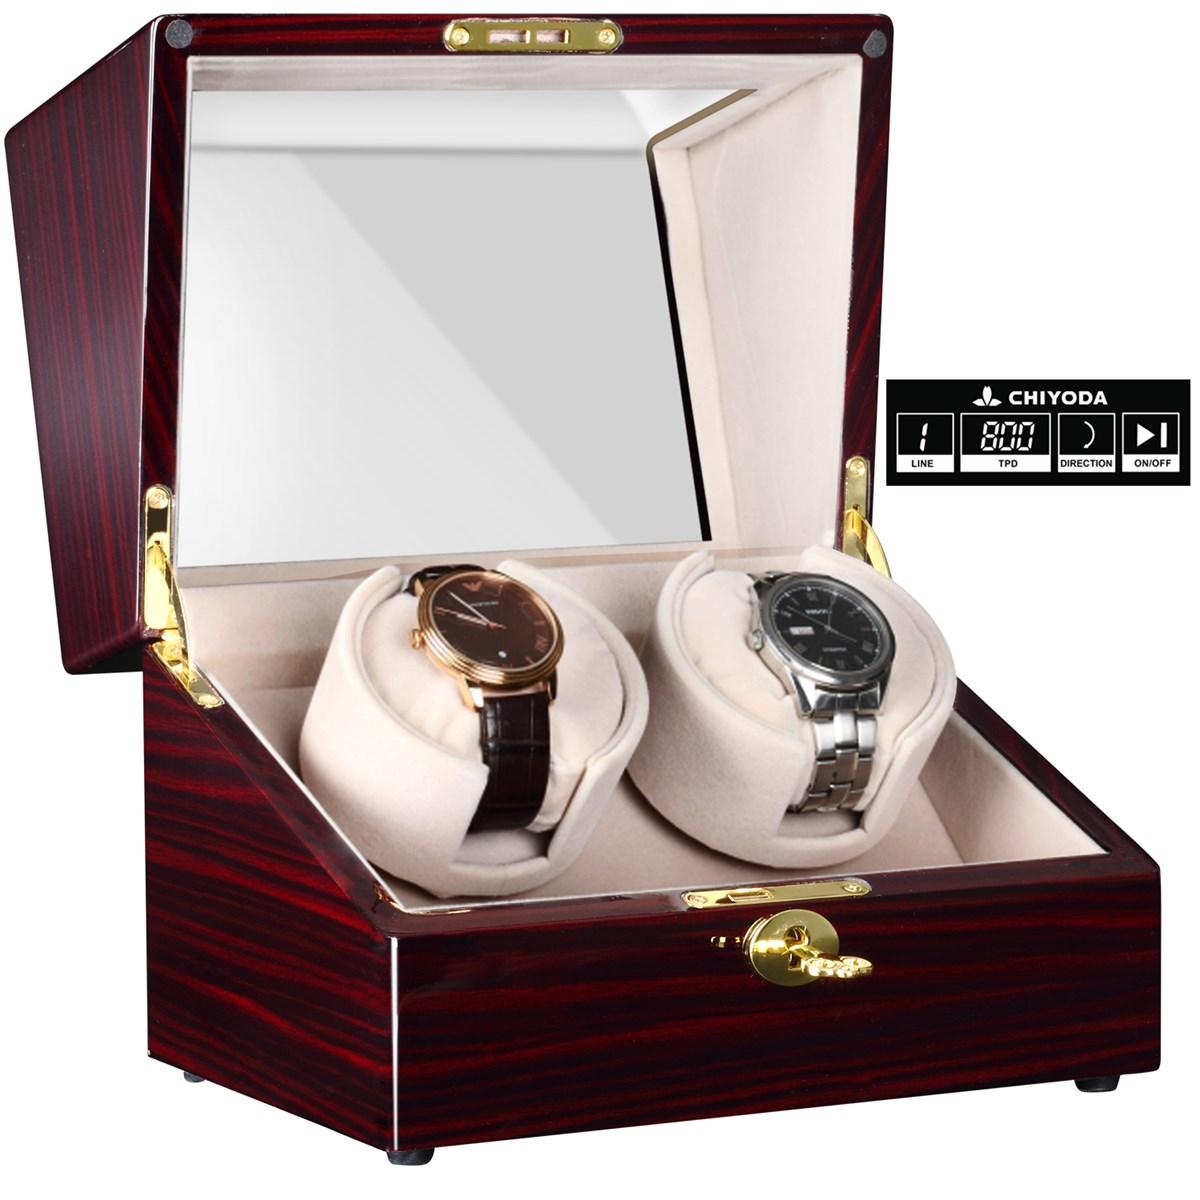 CHIYODA Automatic Handmade Double Watch Winder with Quiet Mabuchi Motor LCD Digital Display